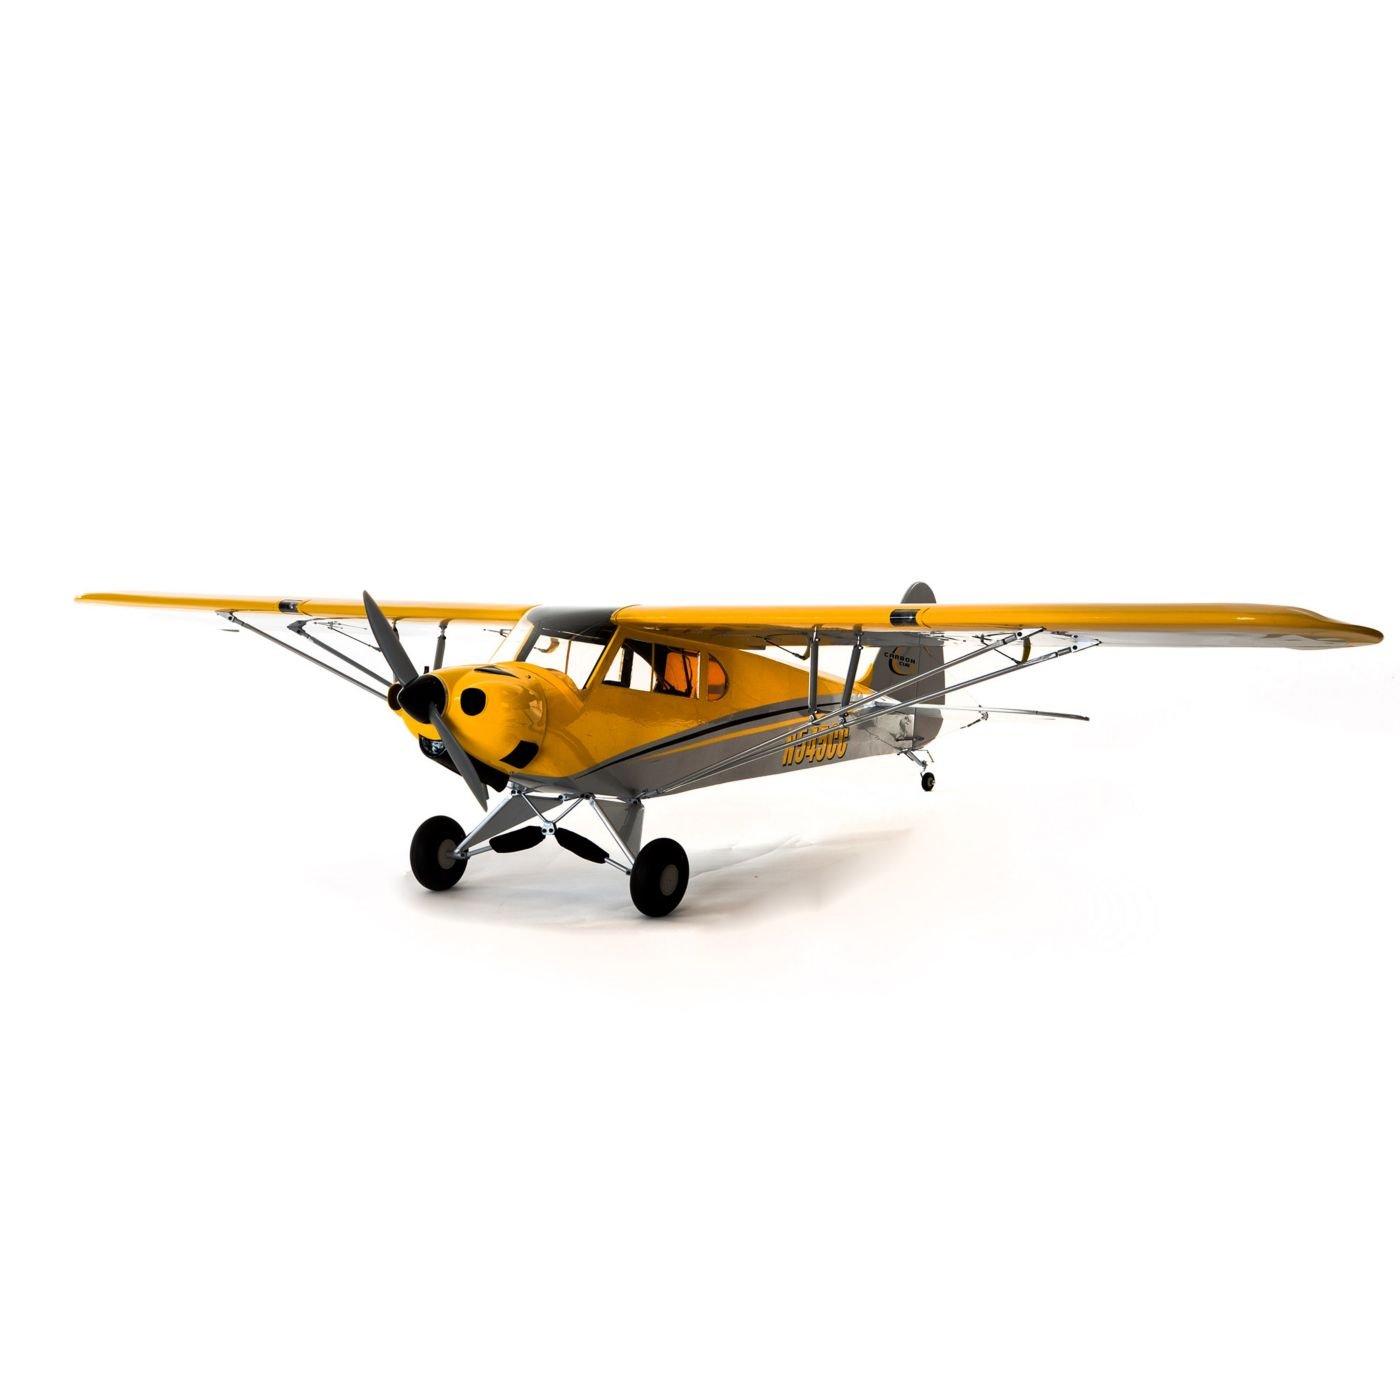 Hangar Hangar Hangar 9 Carbon Cub 15cc ARF 2f10f7